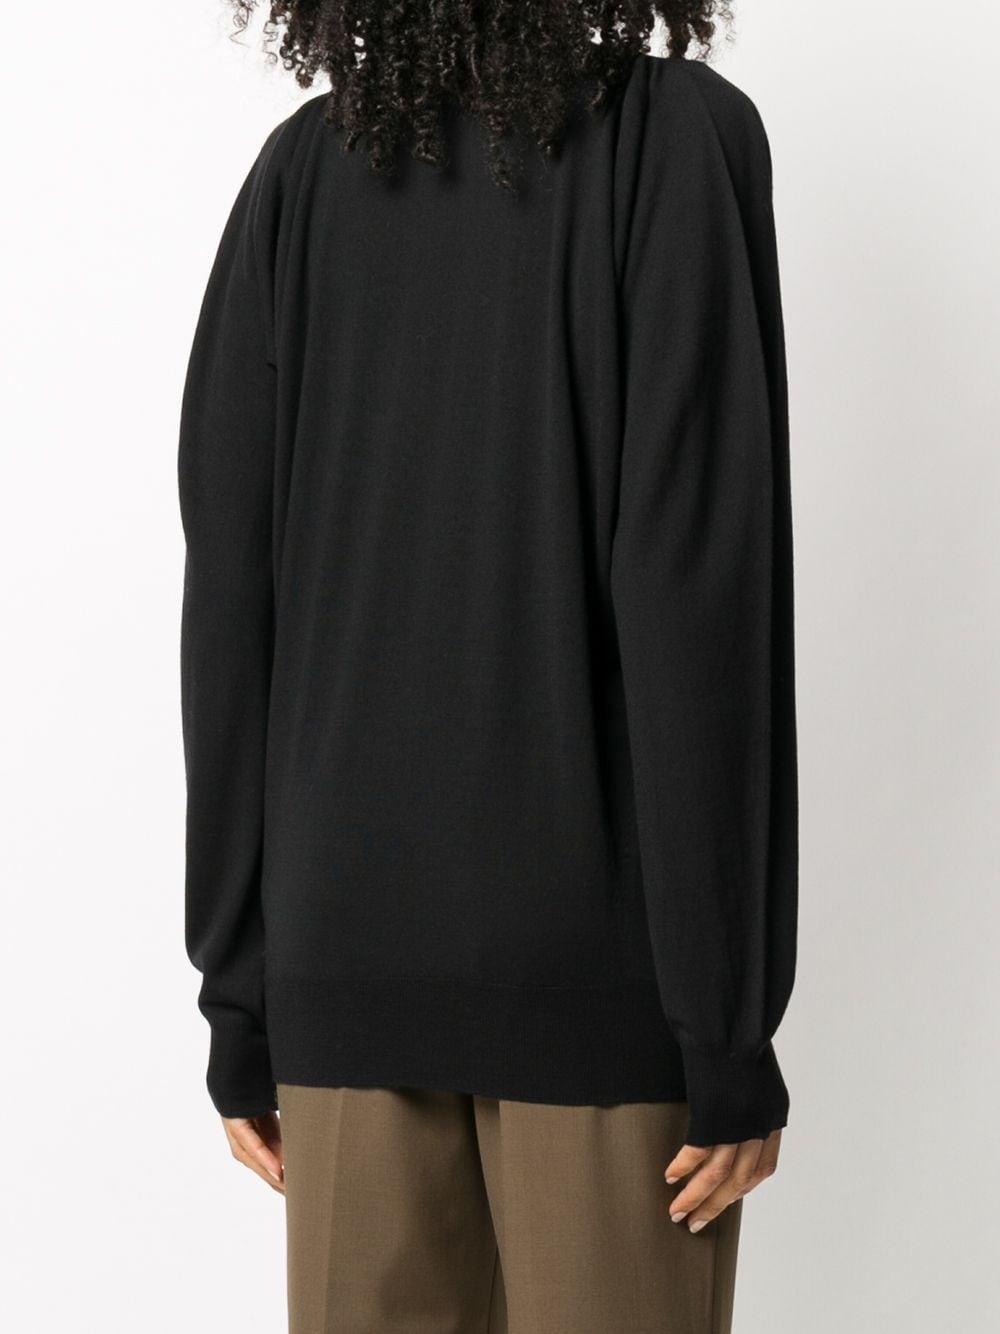 black merino wool oversize knitwear BOTTEGA VENETA |  | 633132-VKWI01000